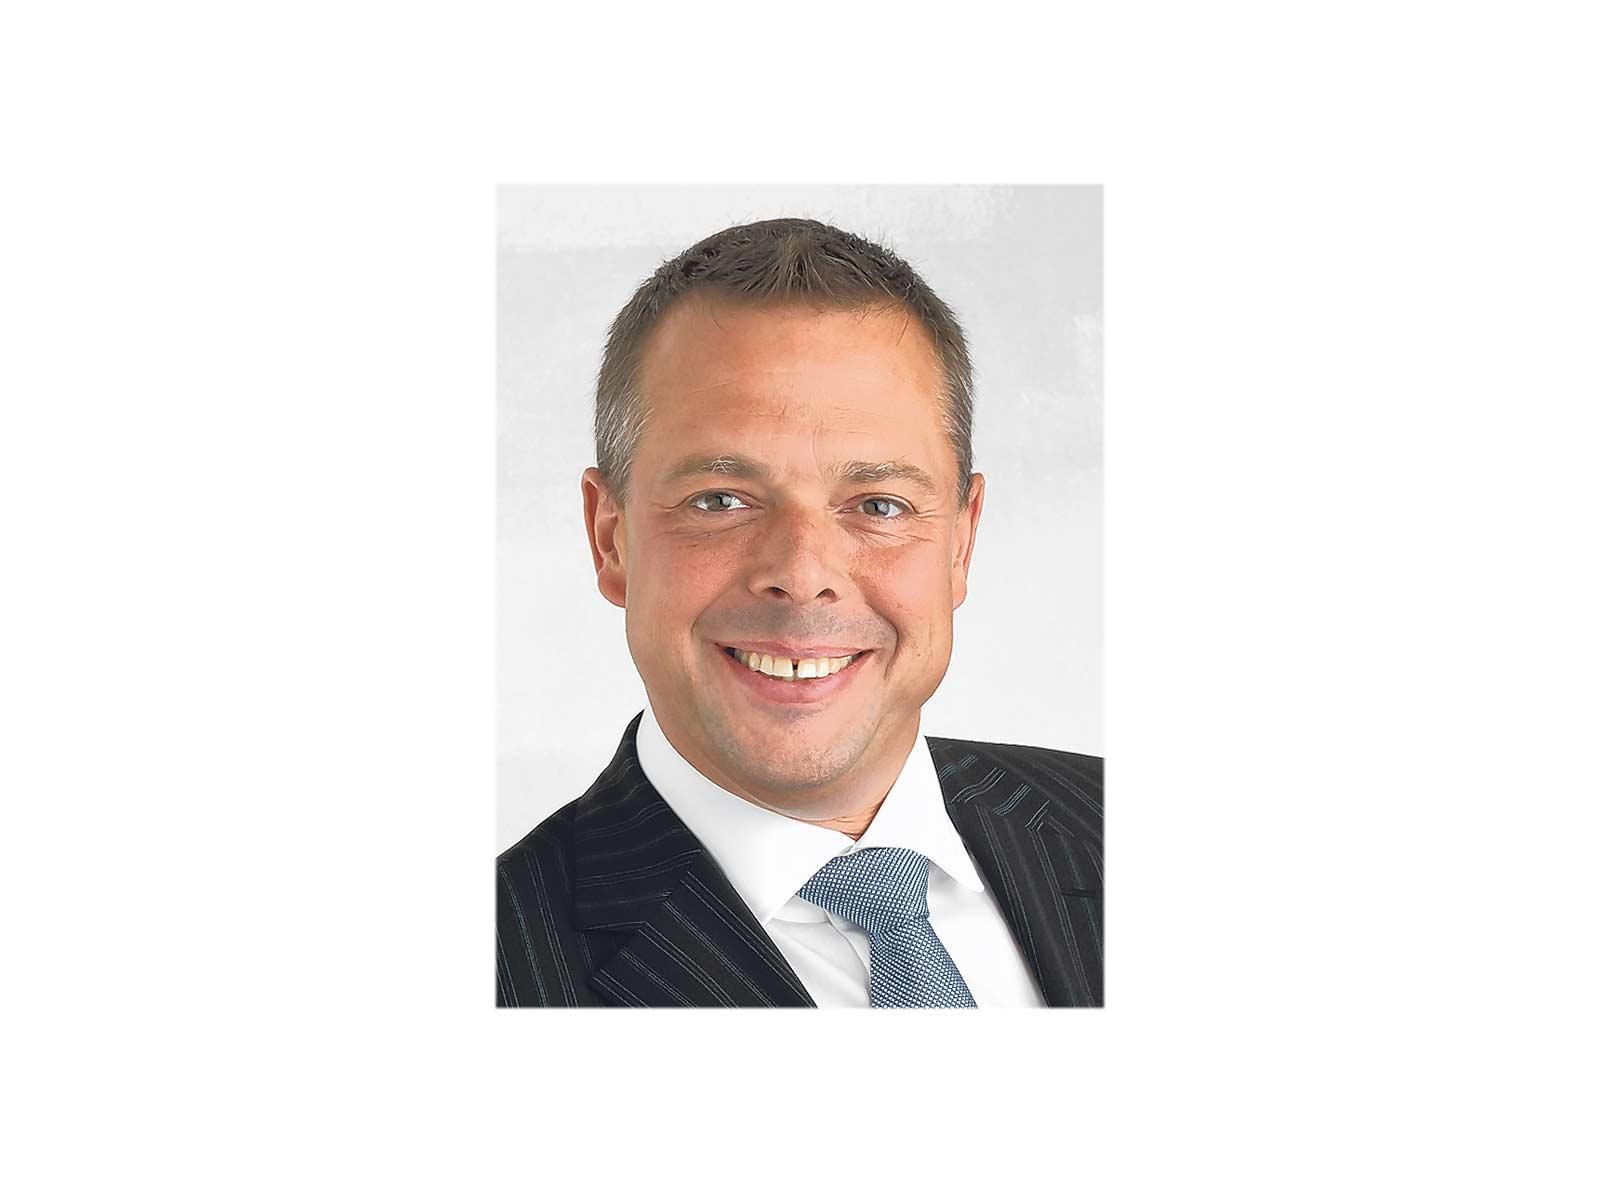 Christoph Marty, Gemeinderat SVP